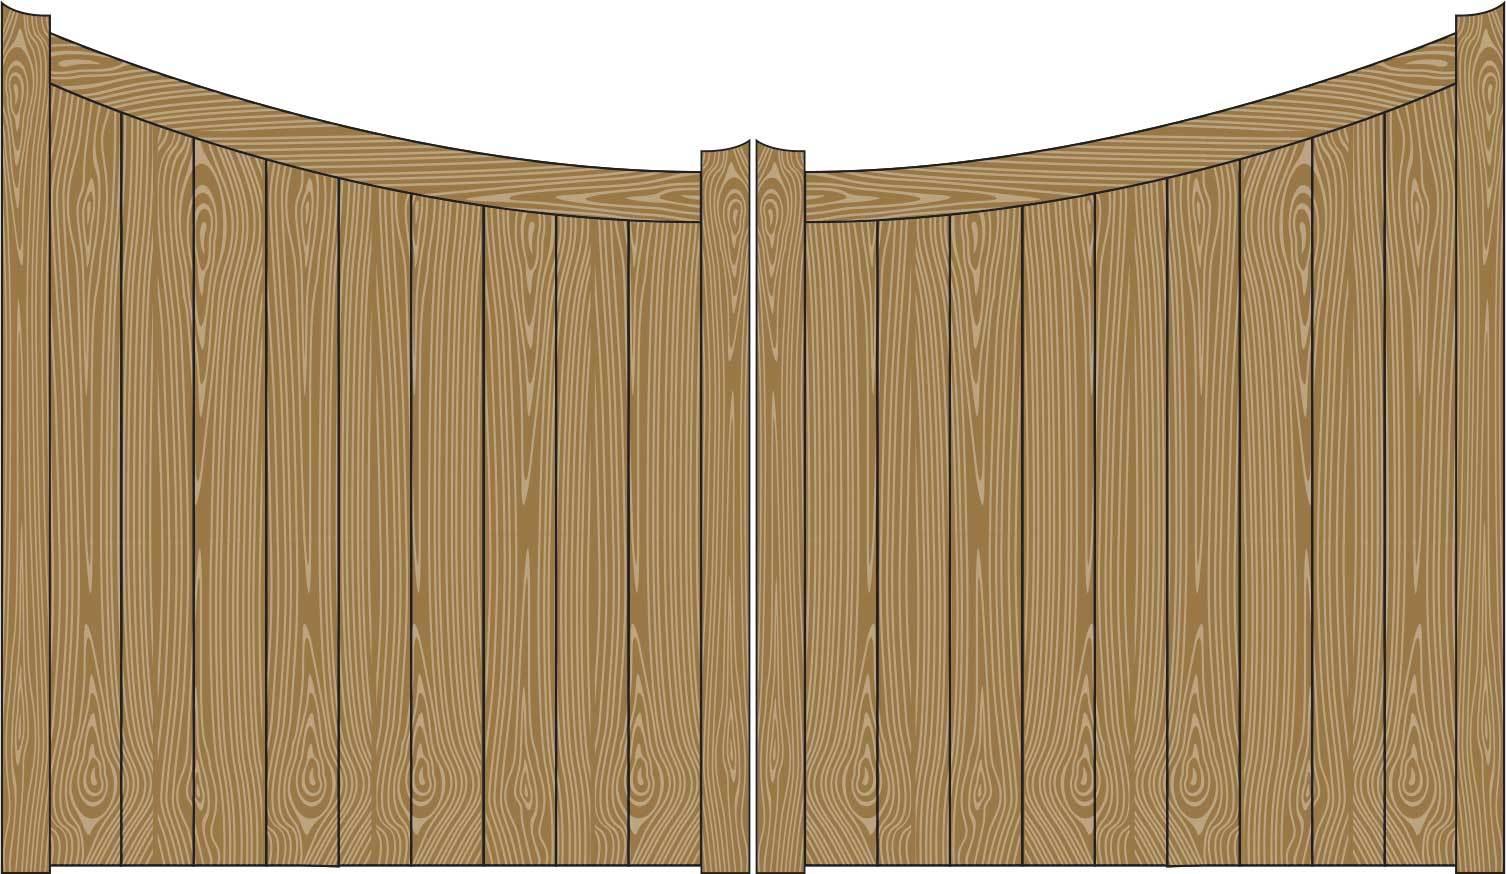 Oxley Gates Wooden Harrogate illustration